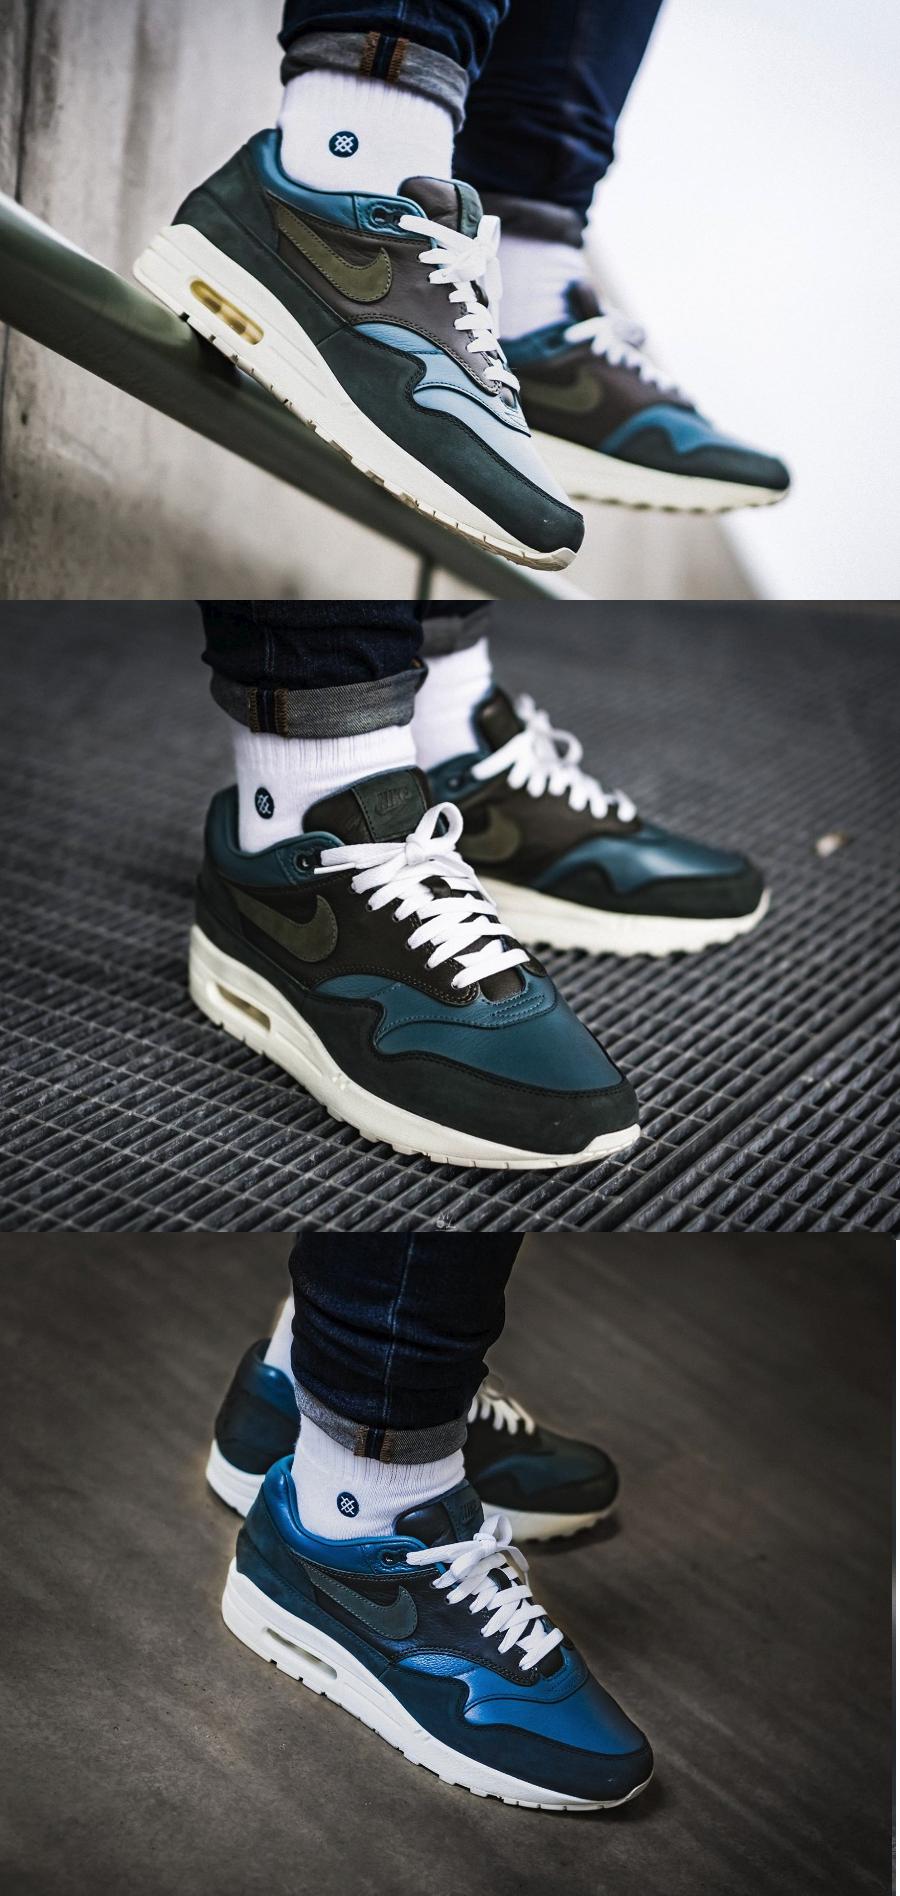 official photos 64554 da414 Nike #AirMax 1 Pinnacle #Iced #Jade | Turnschuhe | Sneakers nike ...